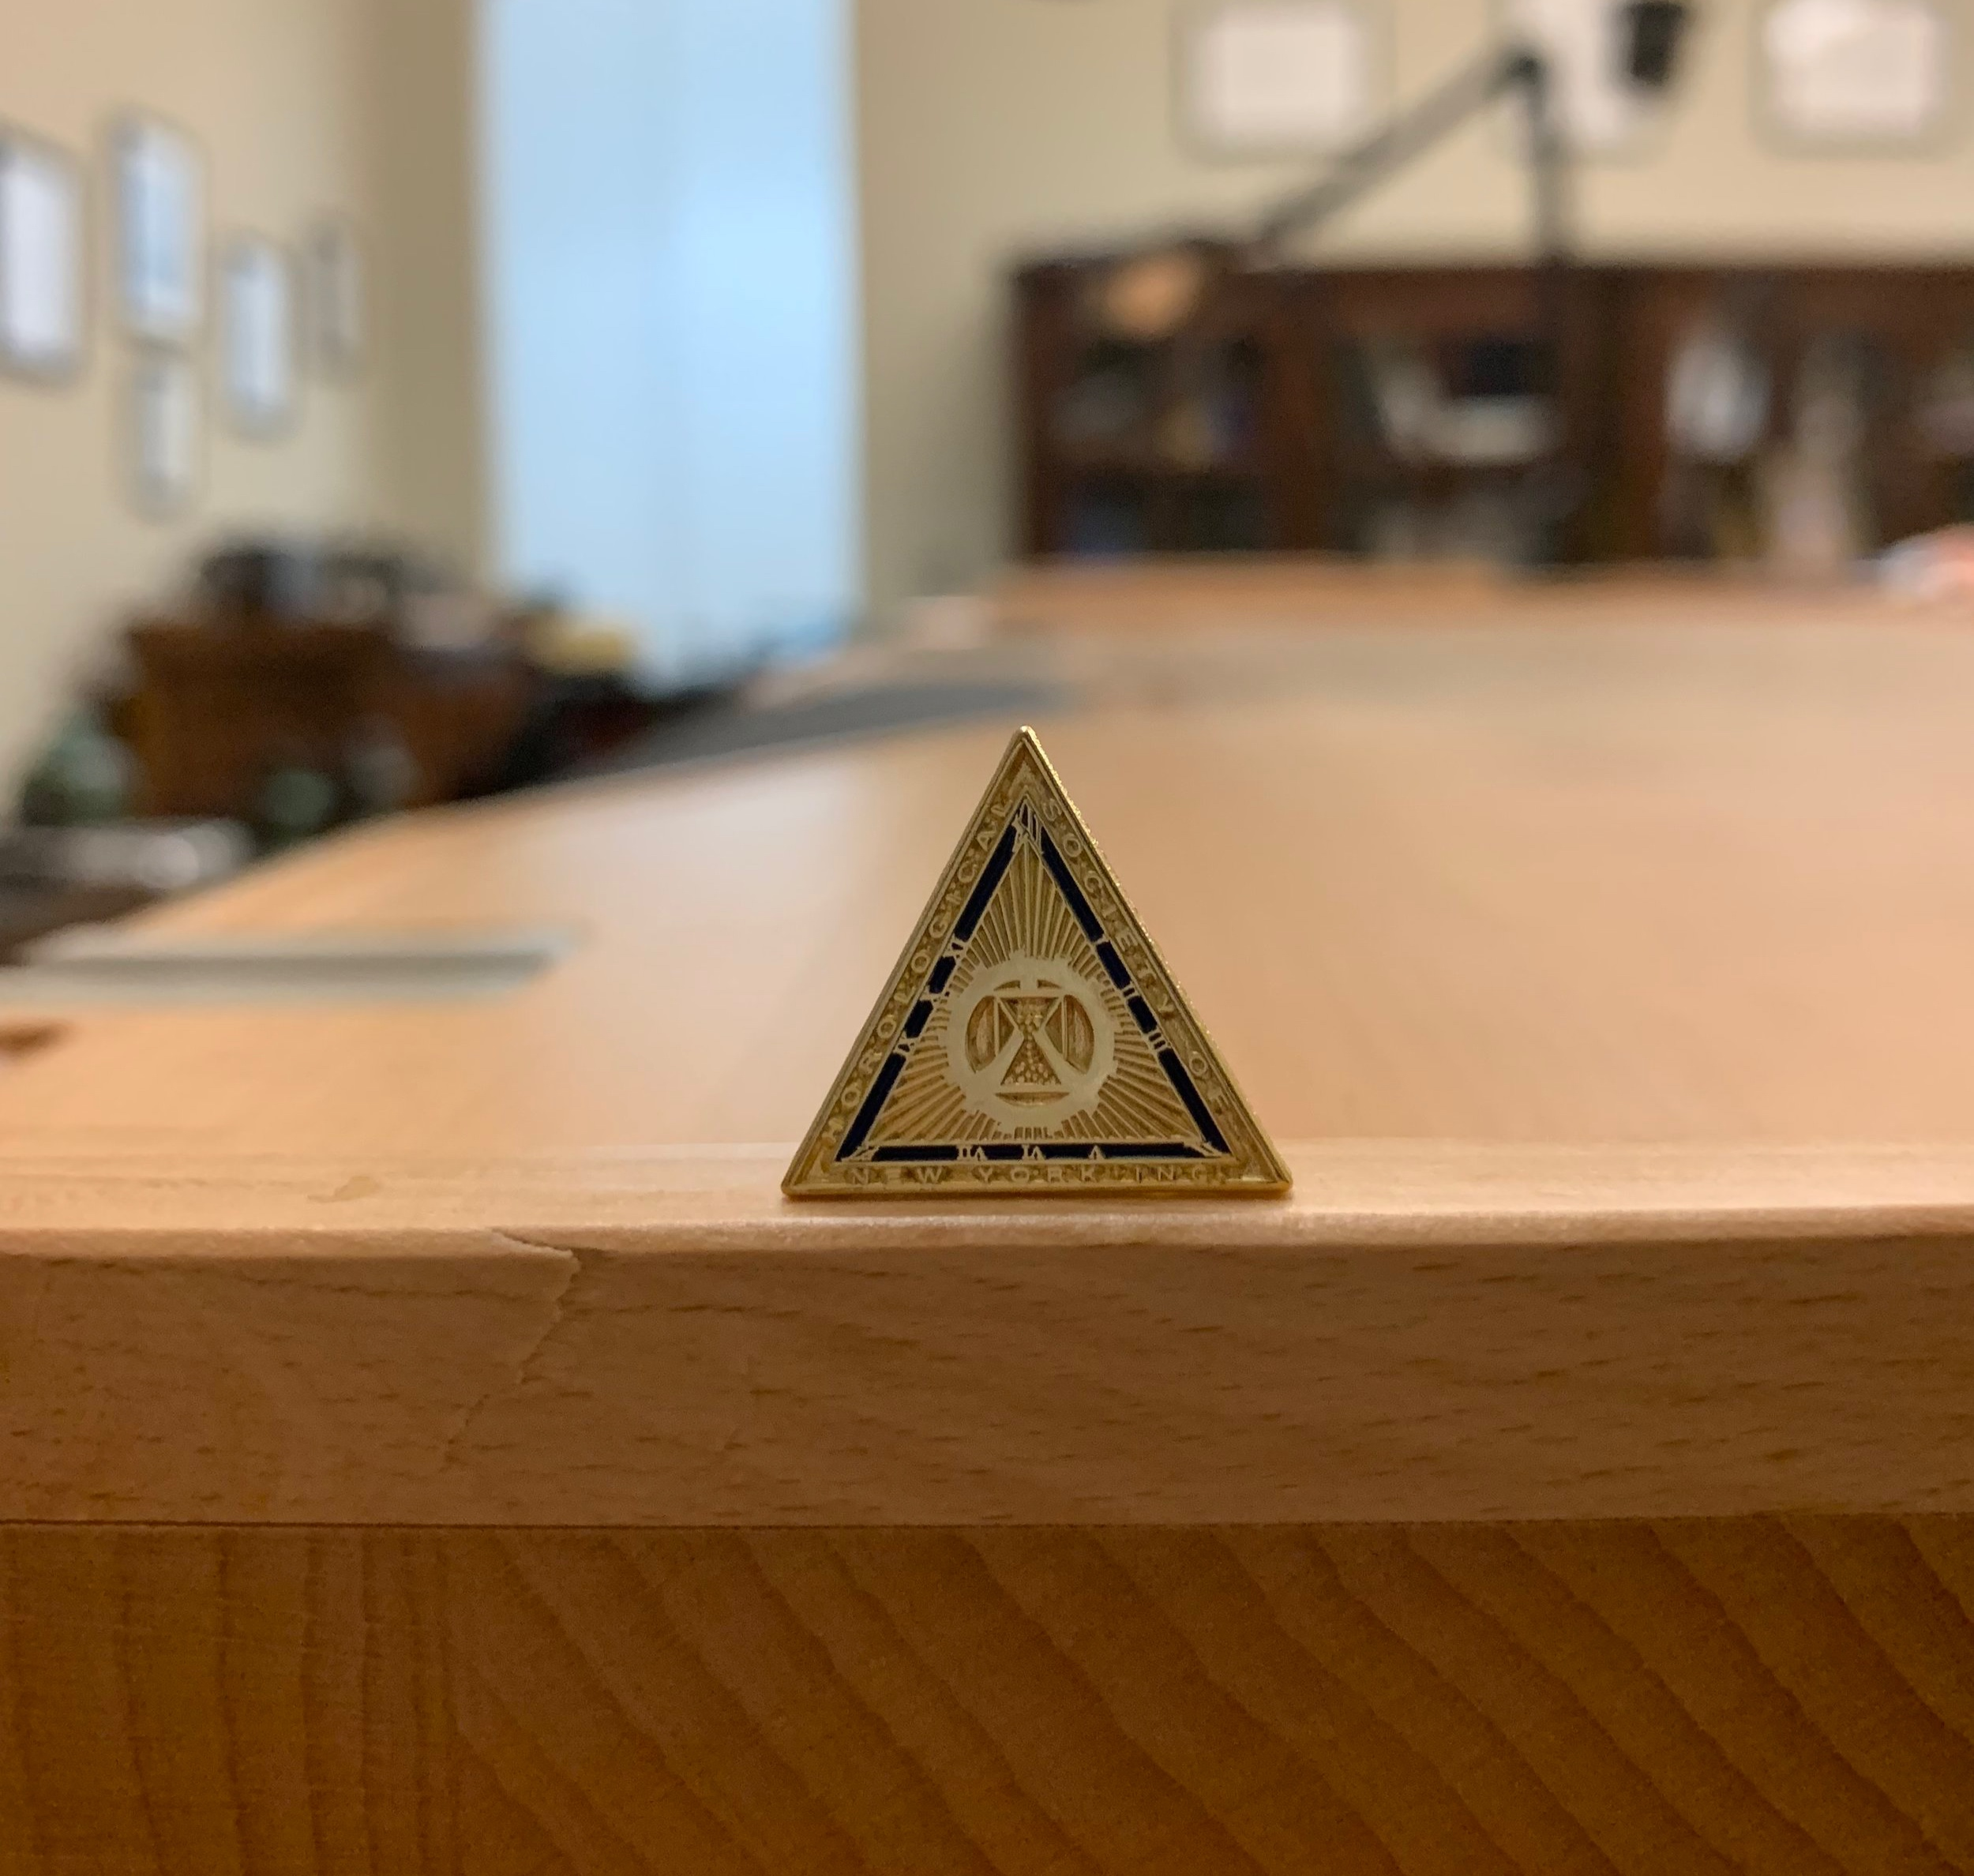 HSNY members receive a lapel pin.